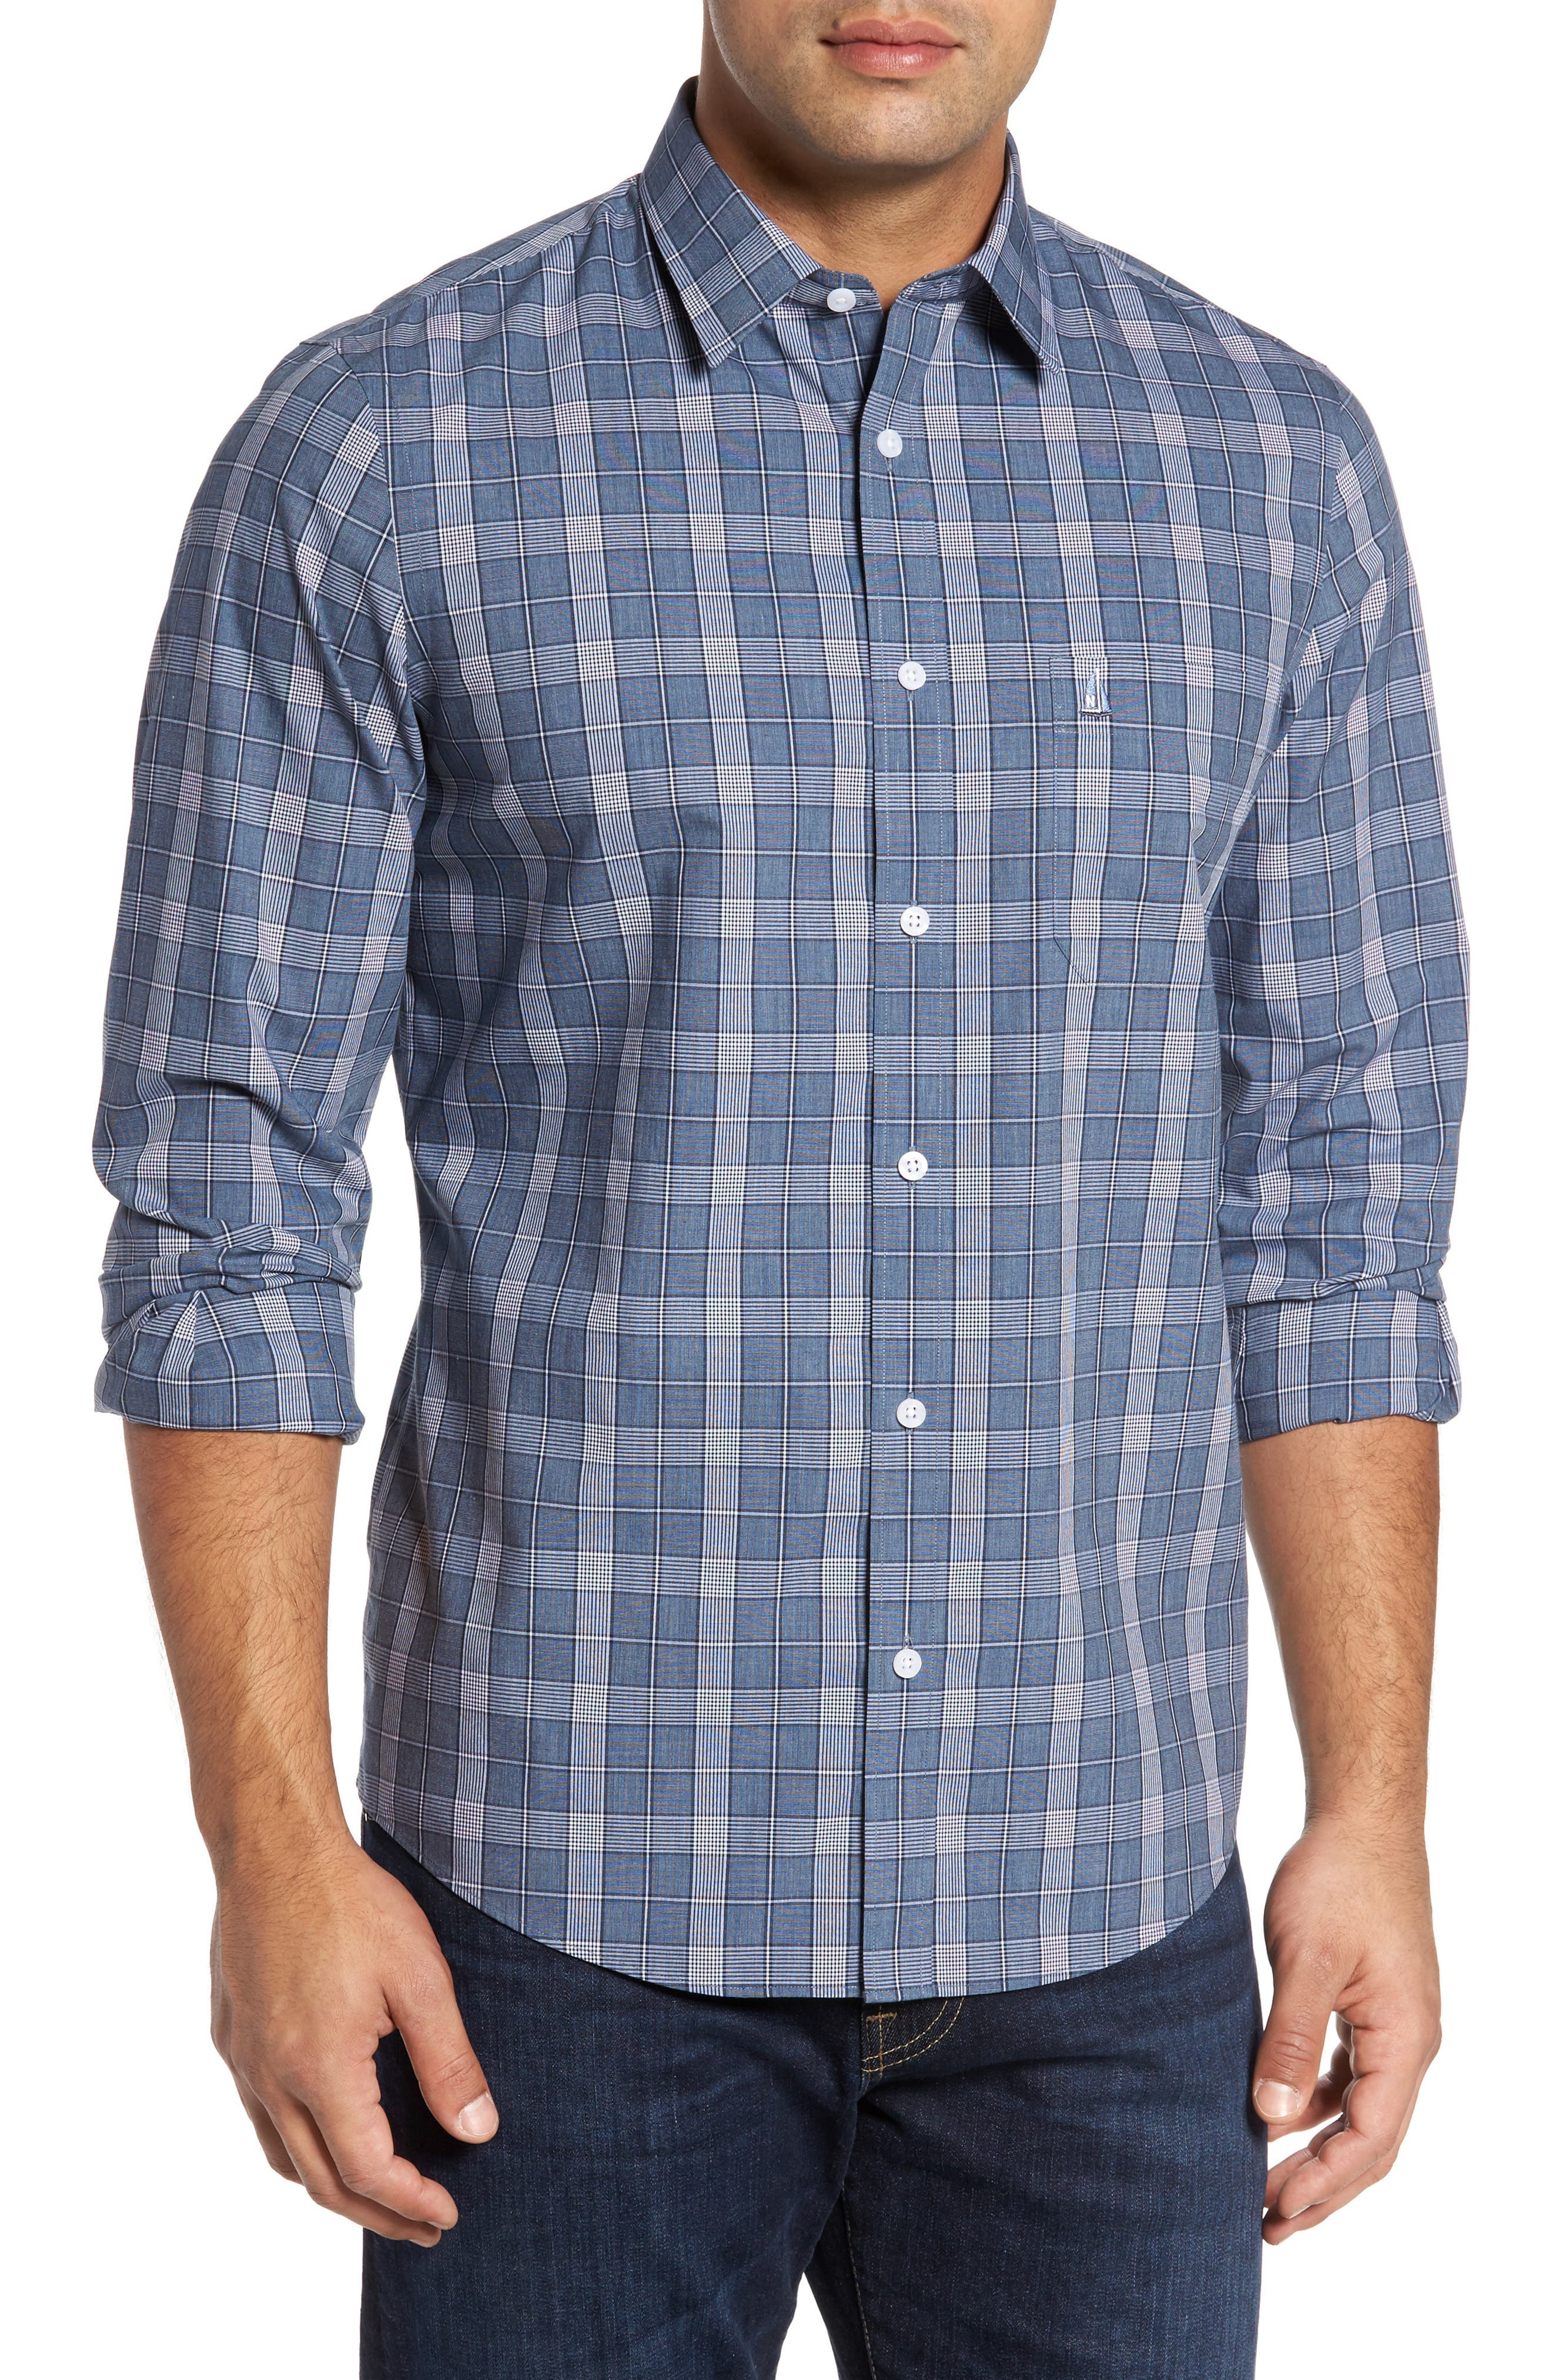 Alternate Image 1 Selected - Nordstrom Men's Shop Non-Iron Spade Plaid Sport Shirt